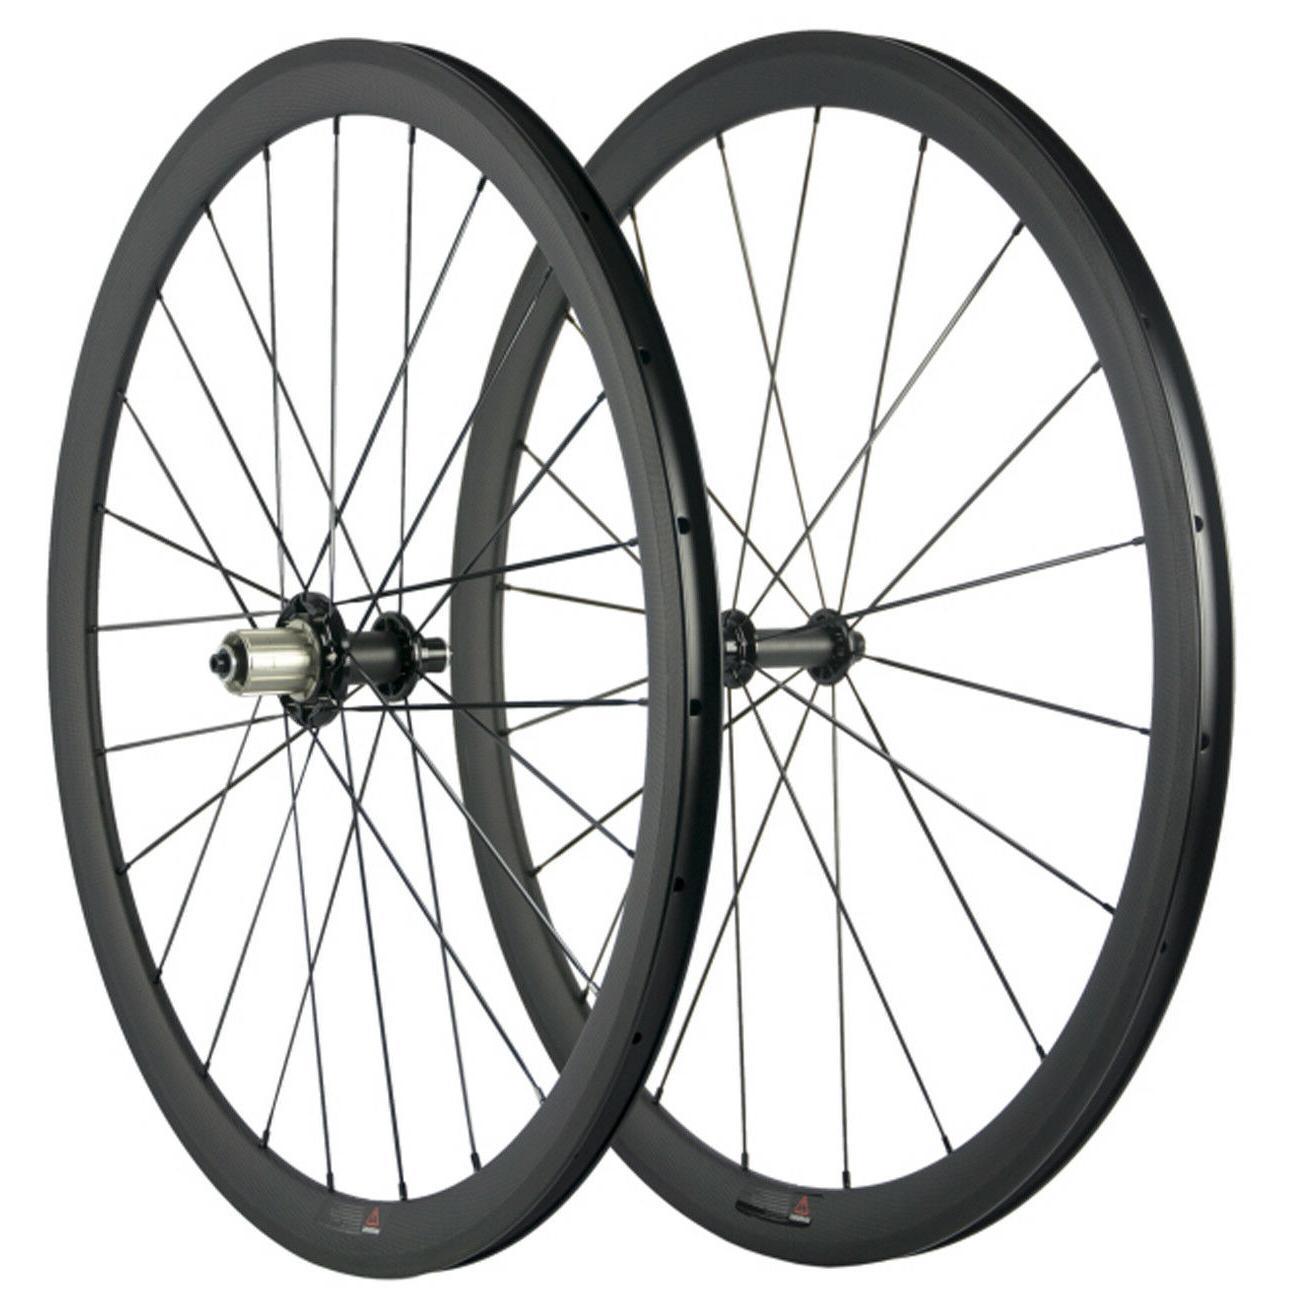 700c clincher carbon fiber wheels 38mm wheel